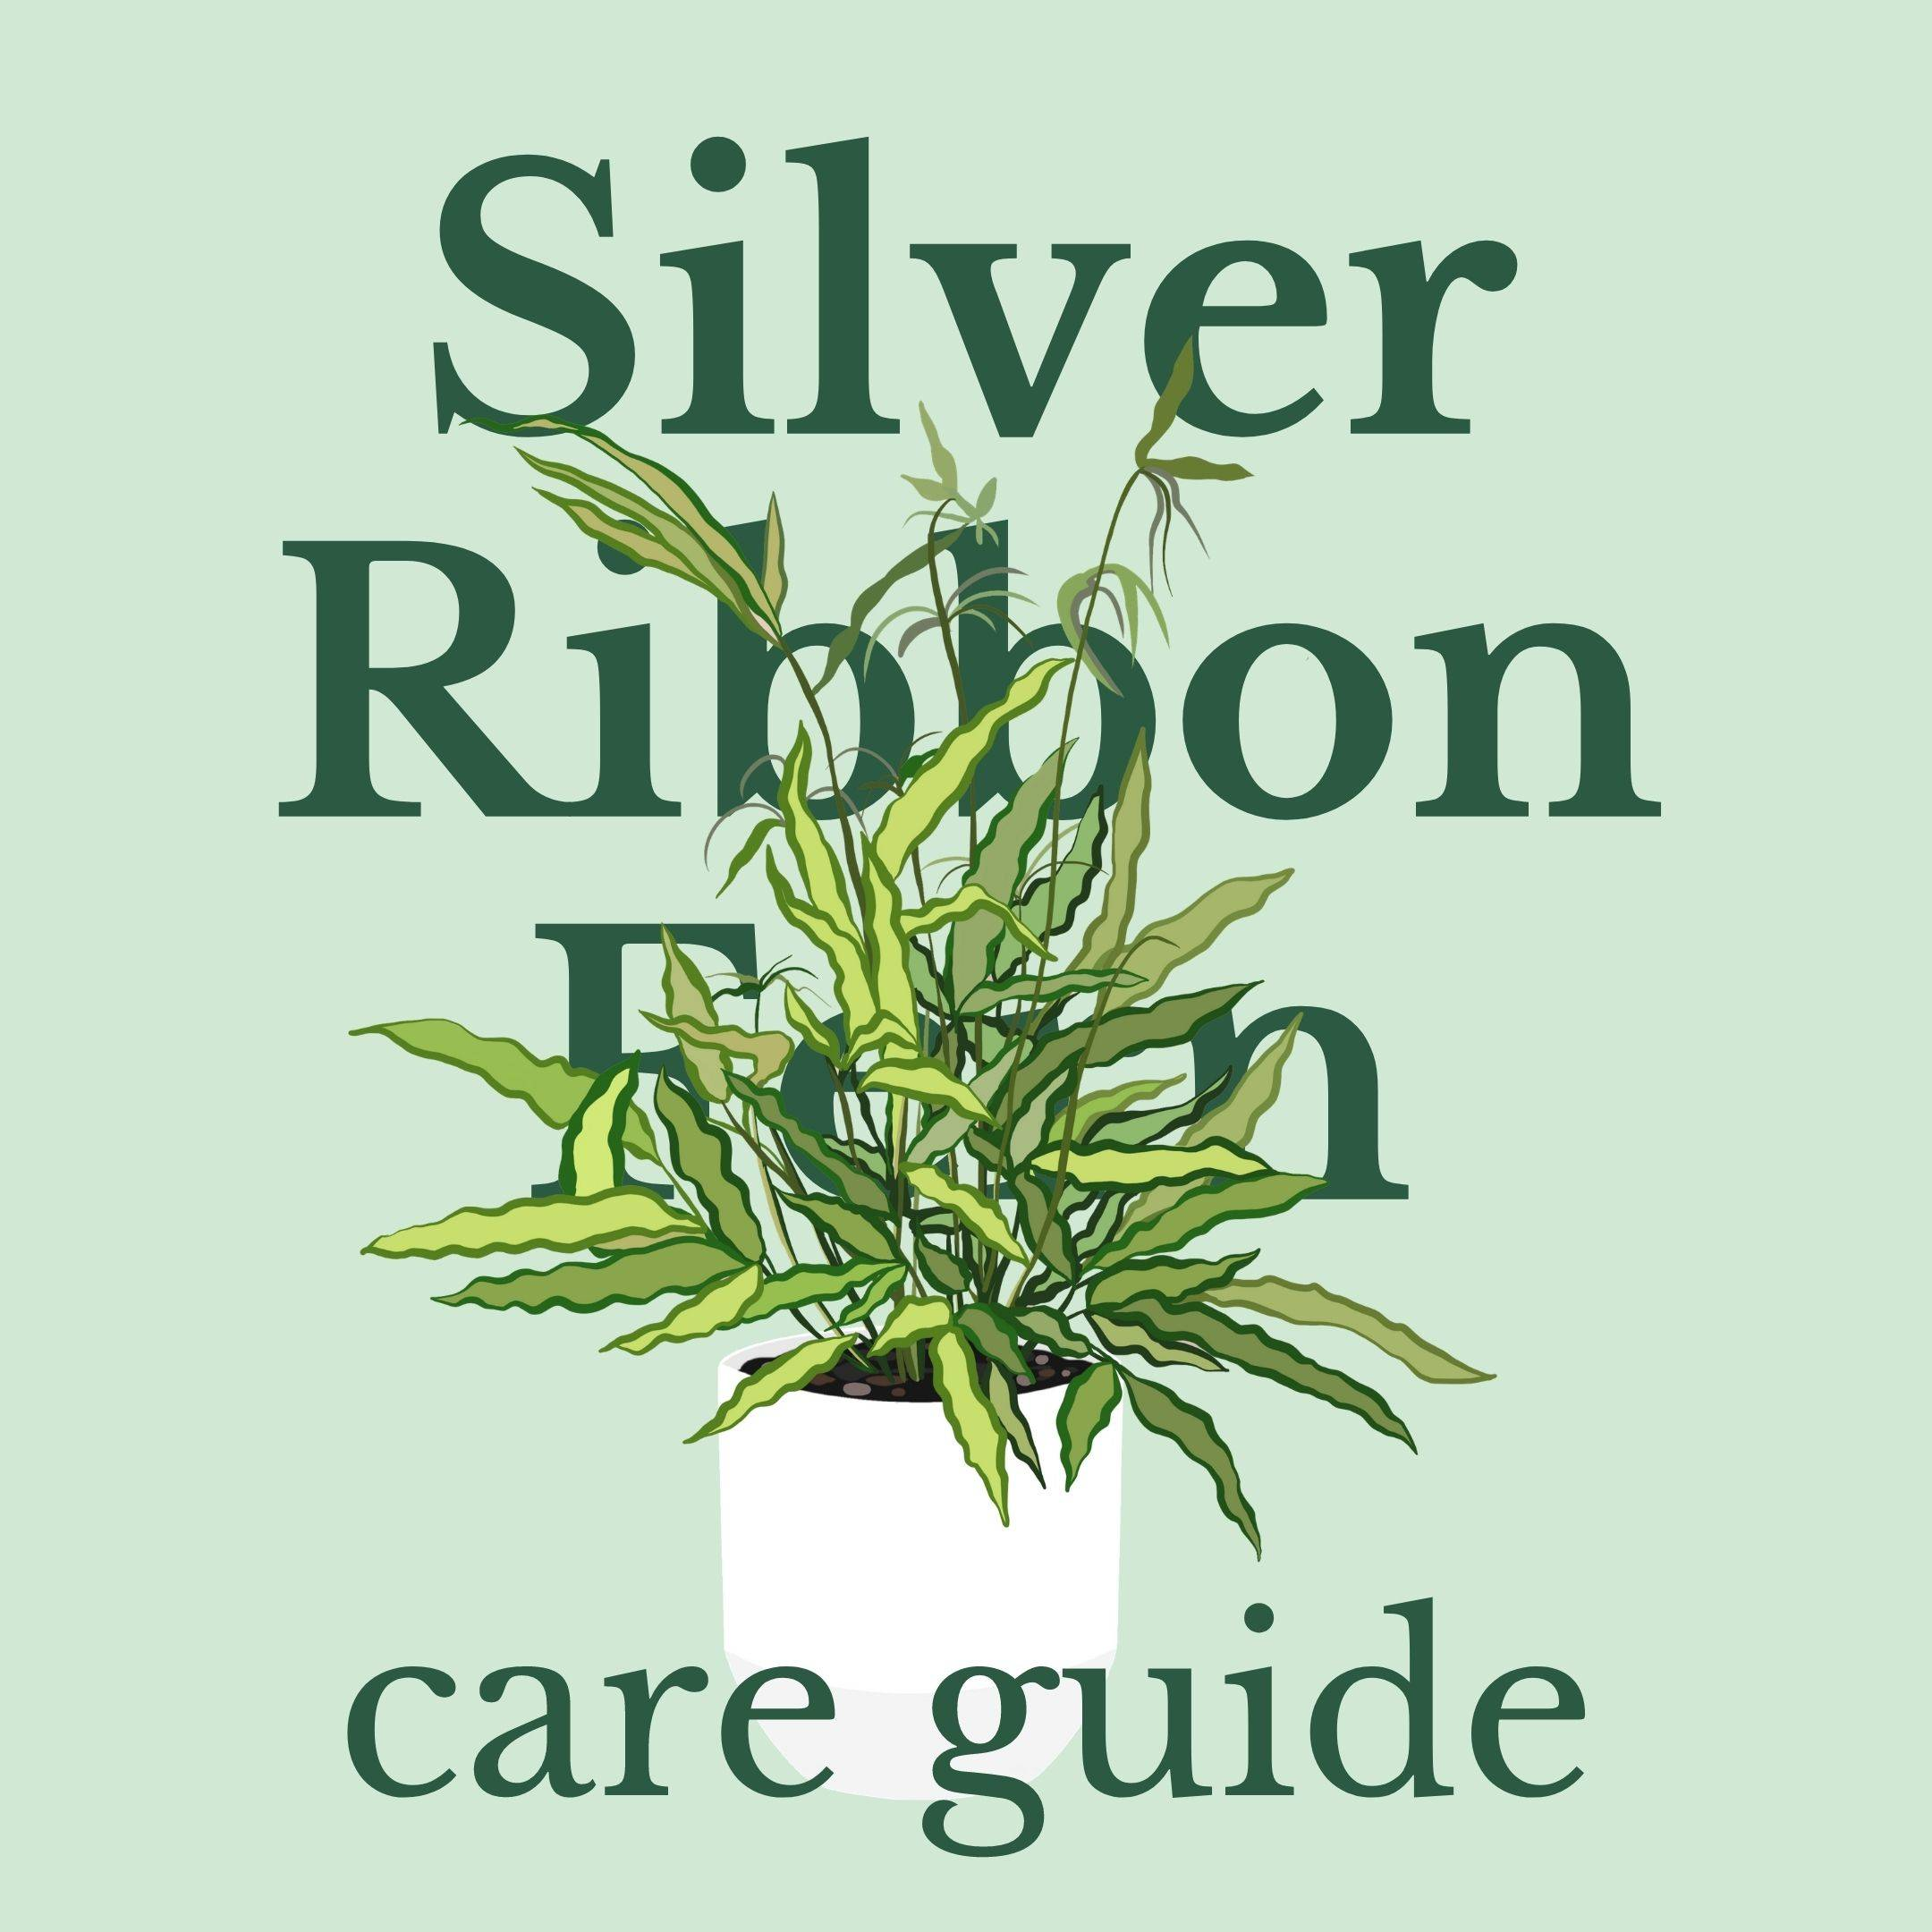 Drawing of silver ribbon fern